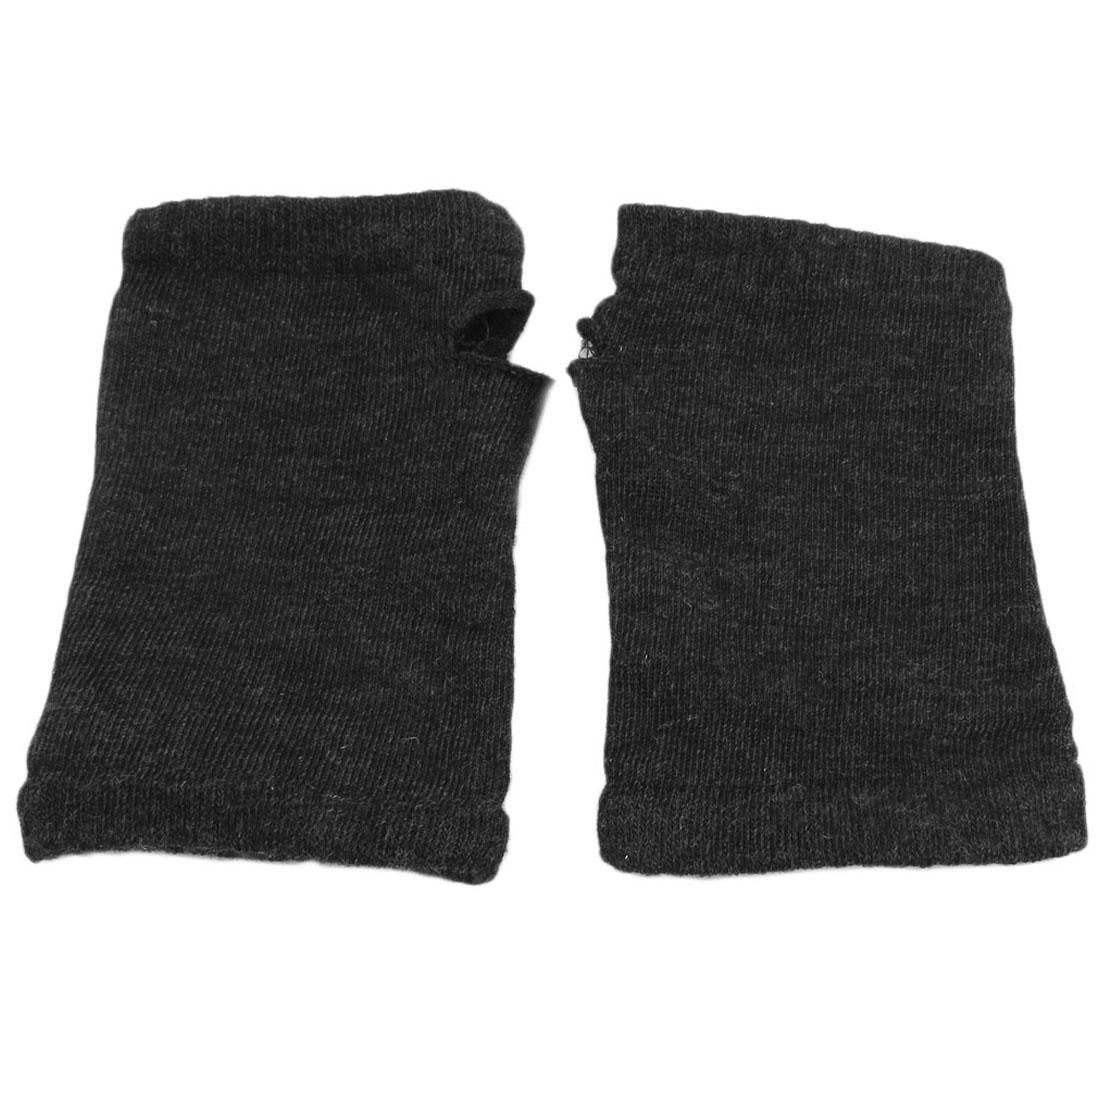 Unisex Cotton Blends Stretchy Fingerless Warm Fashional Soft Gloves Dark Gray Pair